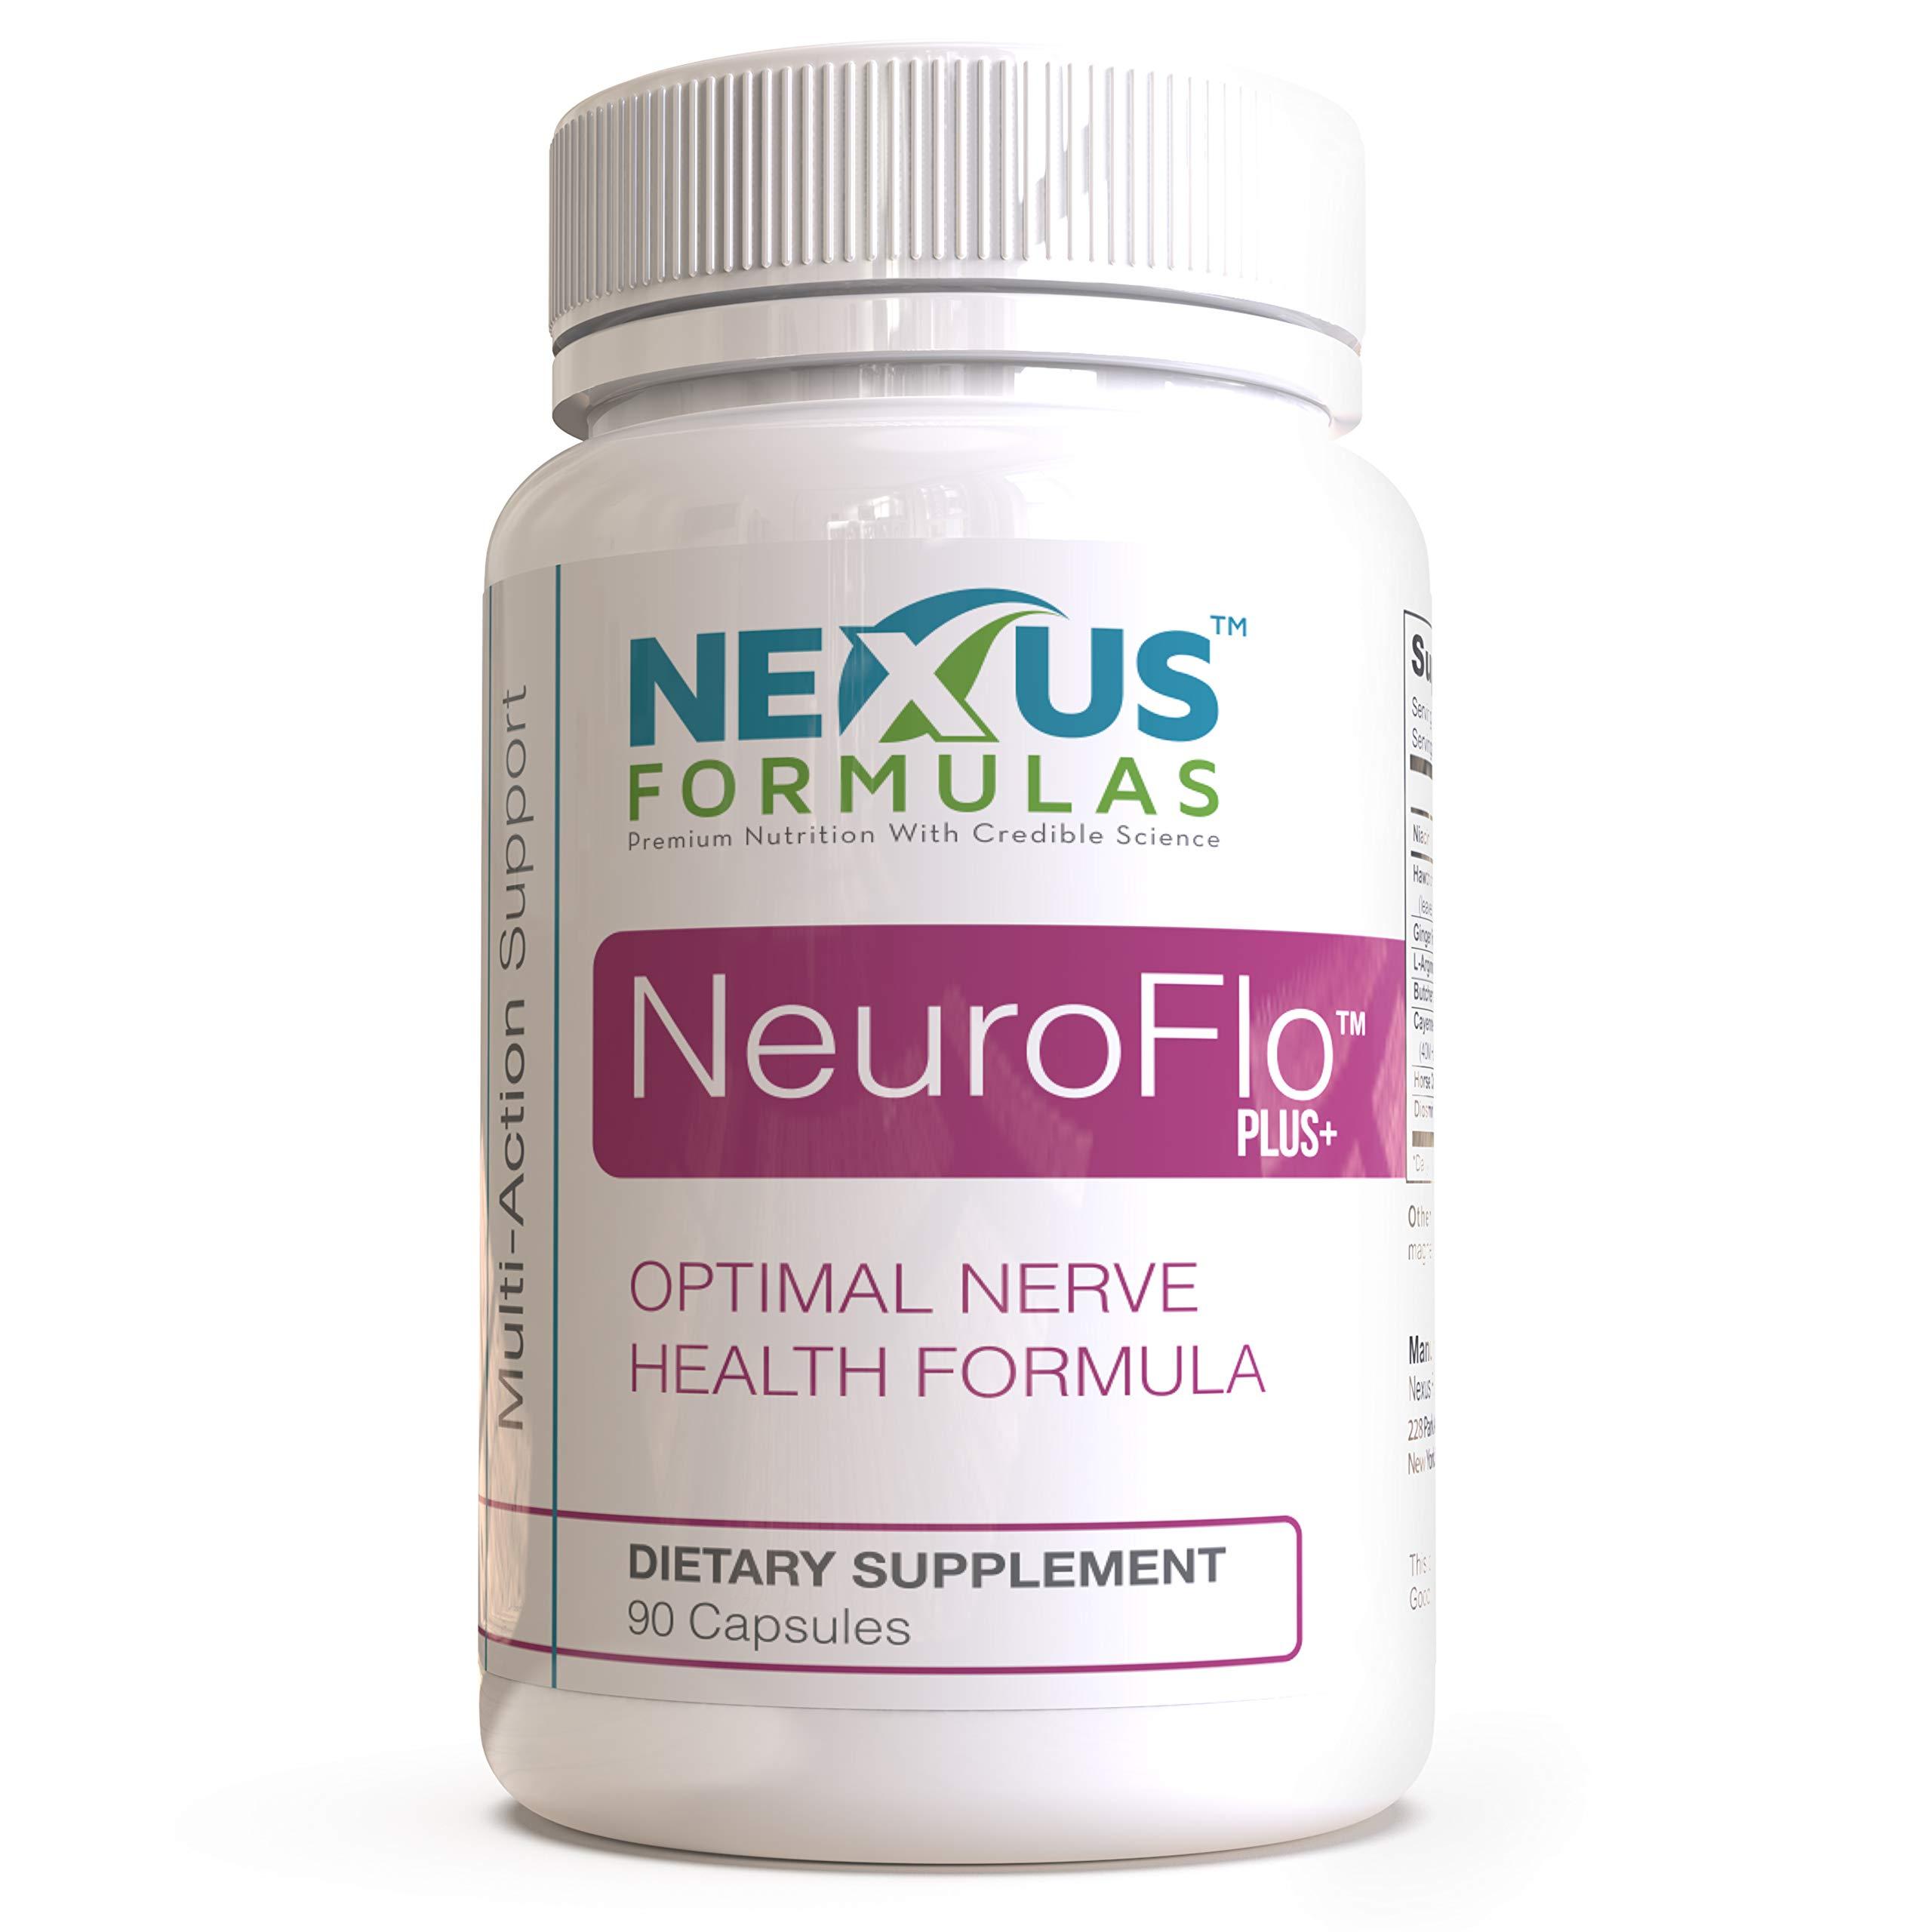 Nexus Formulas - NEUROFLO - Nerve Health and Circulation Formula by Nexus Formulas